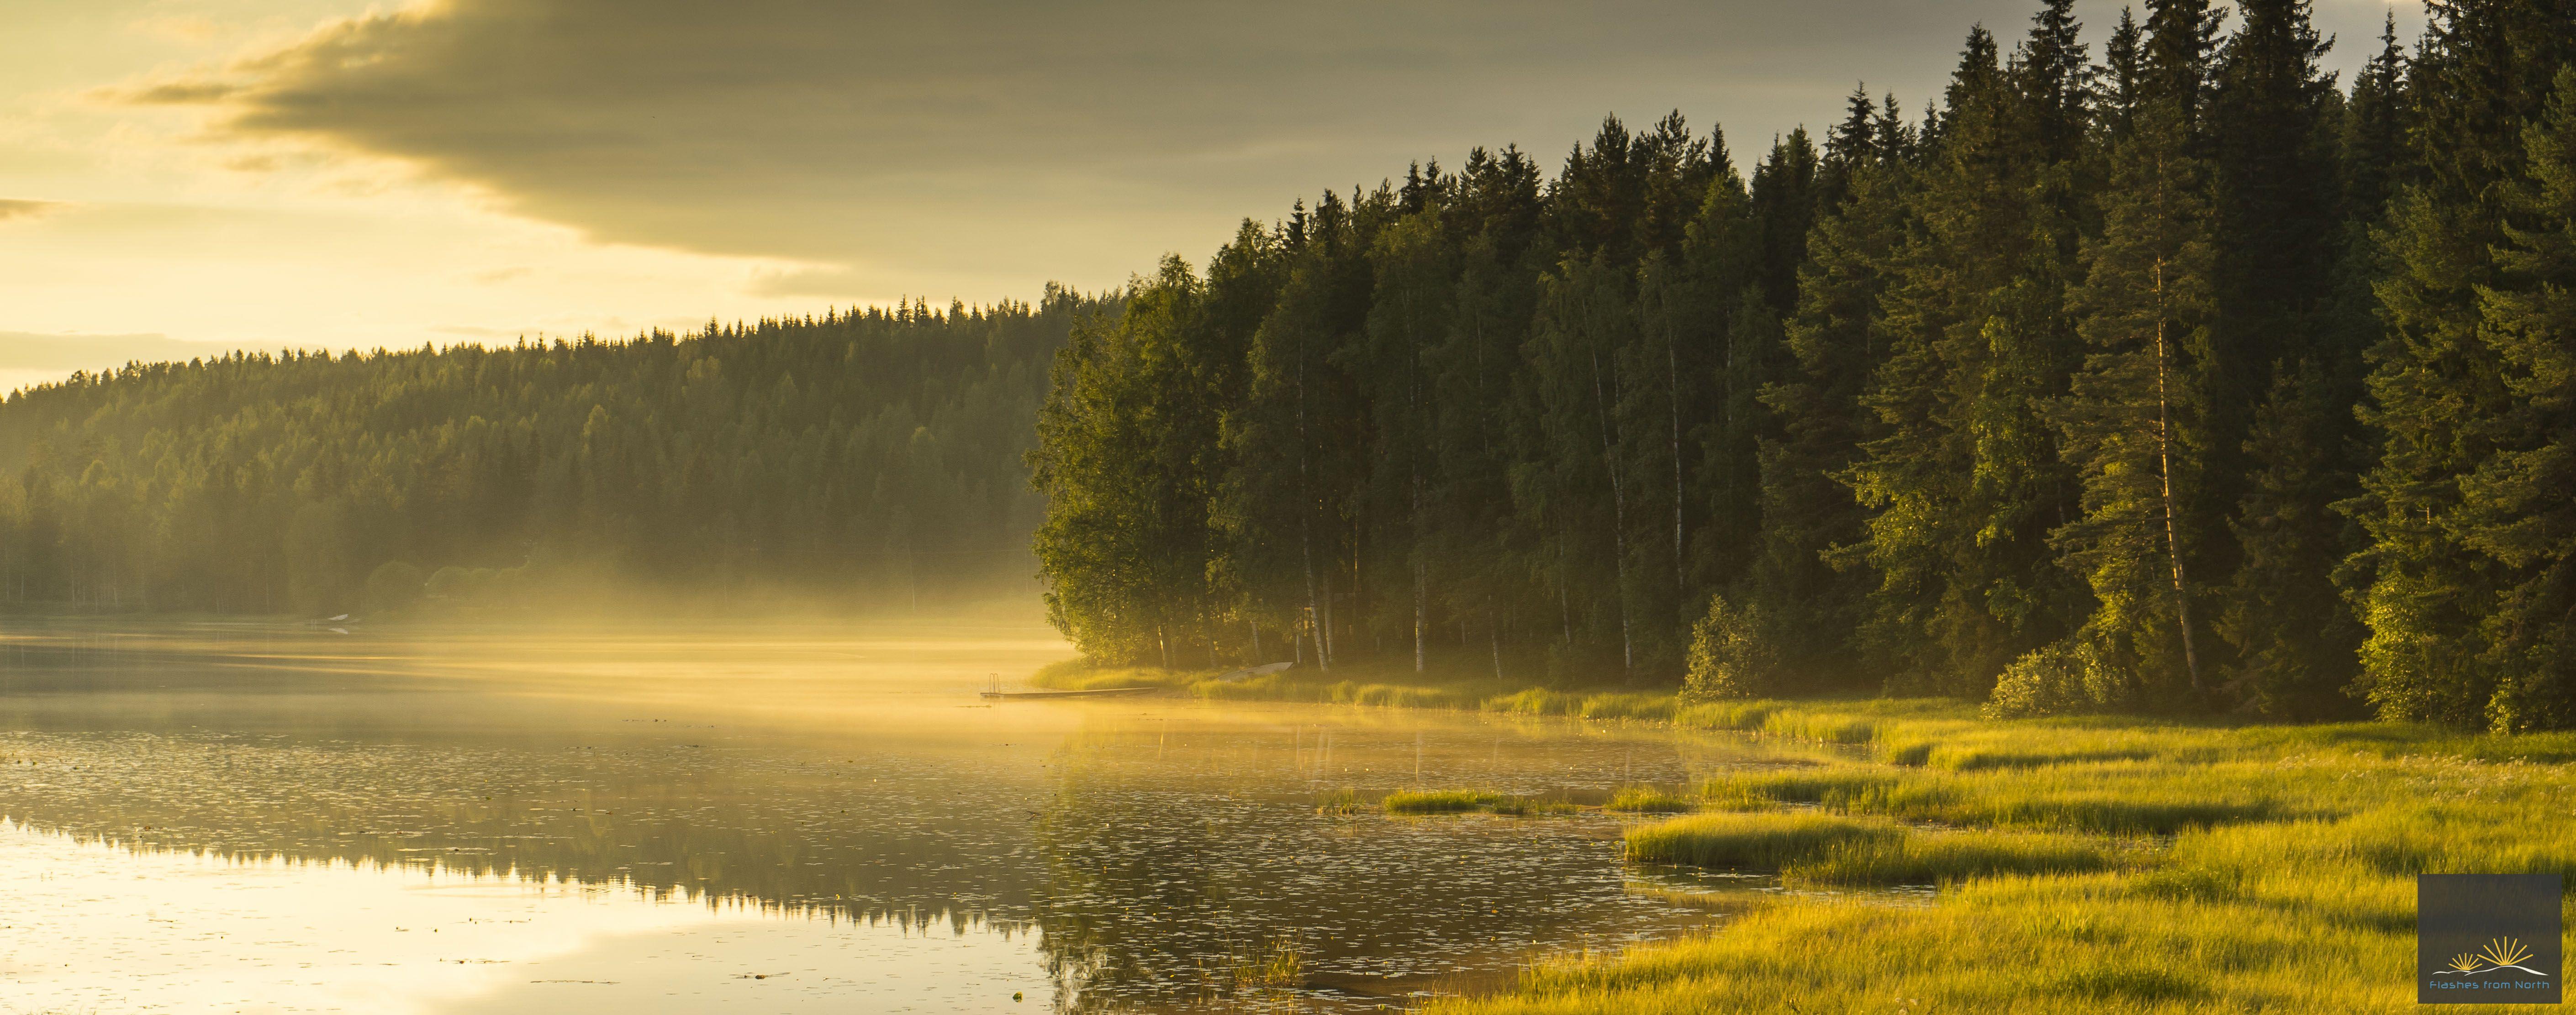 Tales from Pohjola » The Classic Finnish Landscape   FINLAND   Pinterest   Finland, Landscape ...